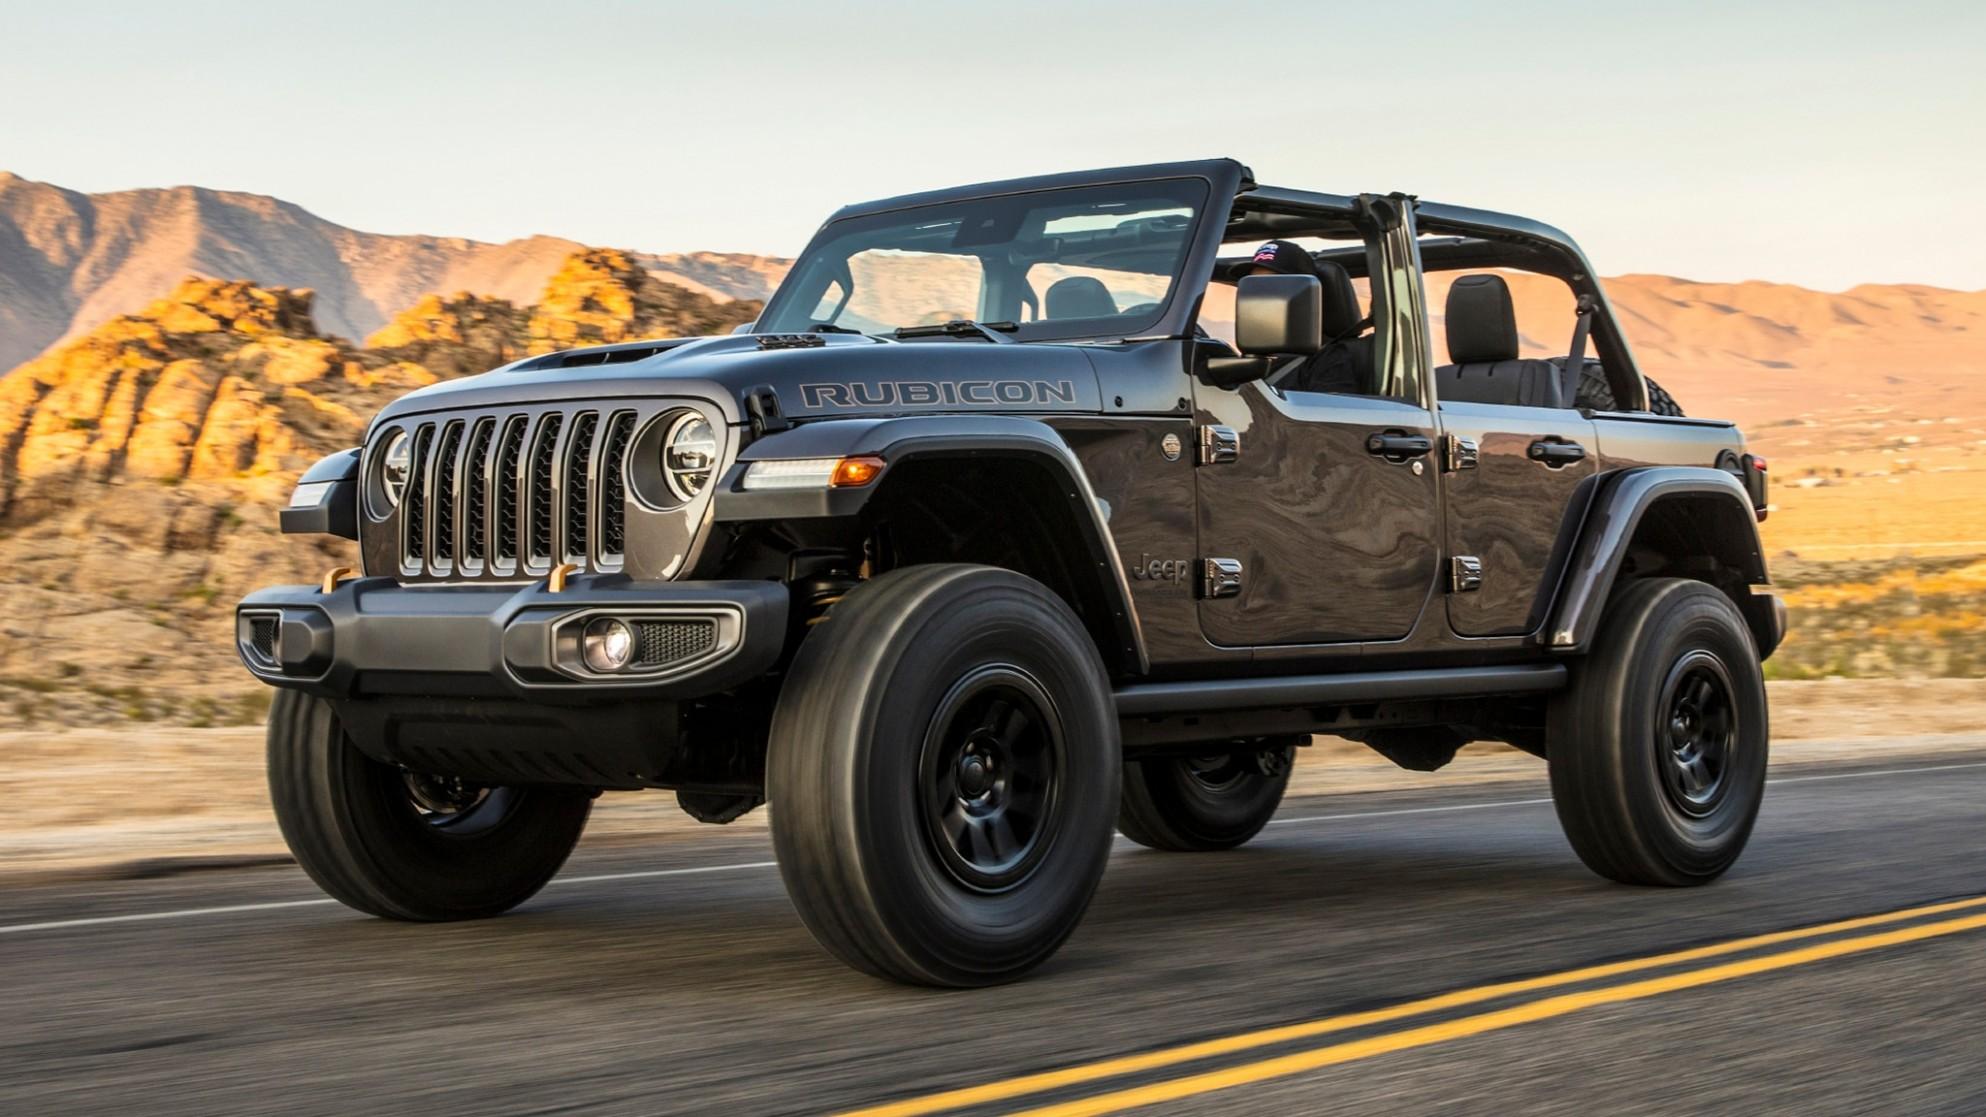 4 Jeep Wrangler Rubicon 4 First Look: The Heckcat Wrangler V - Jeep Jl 2021